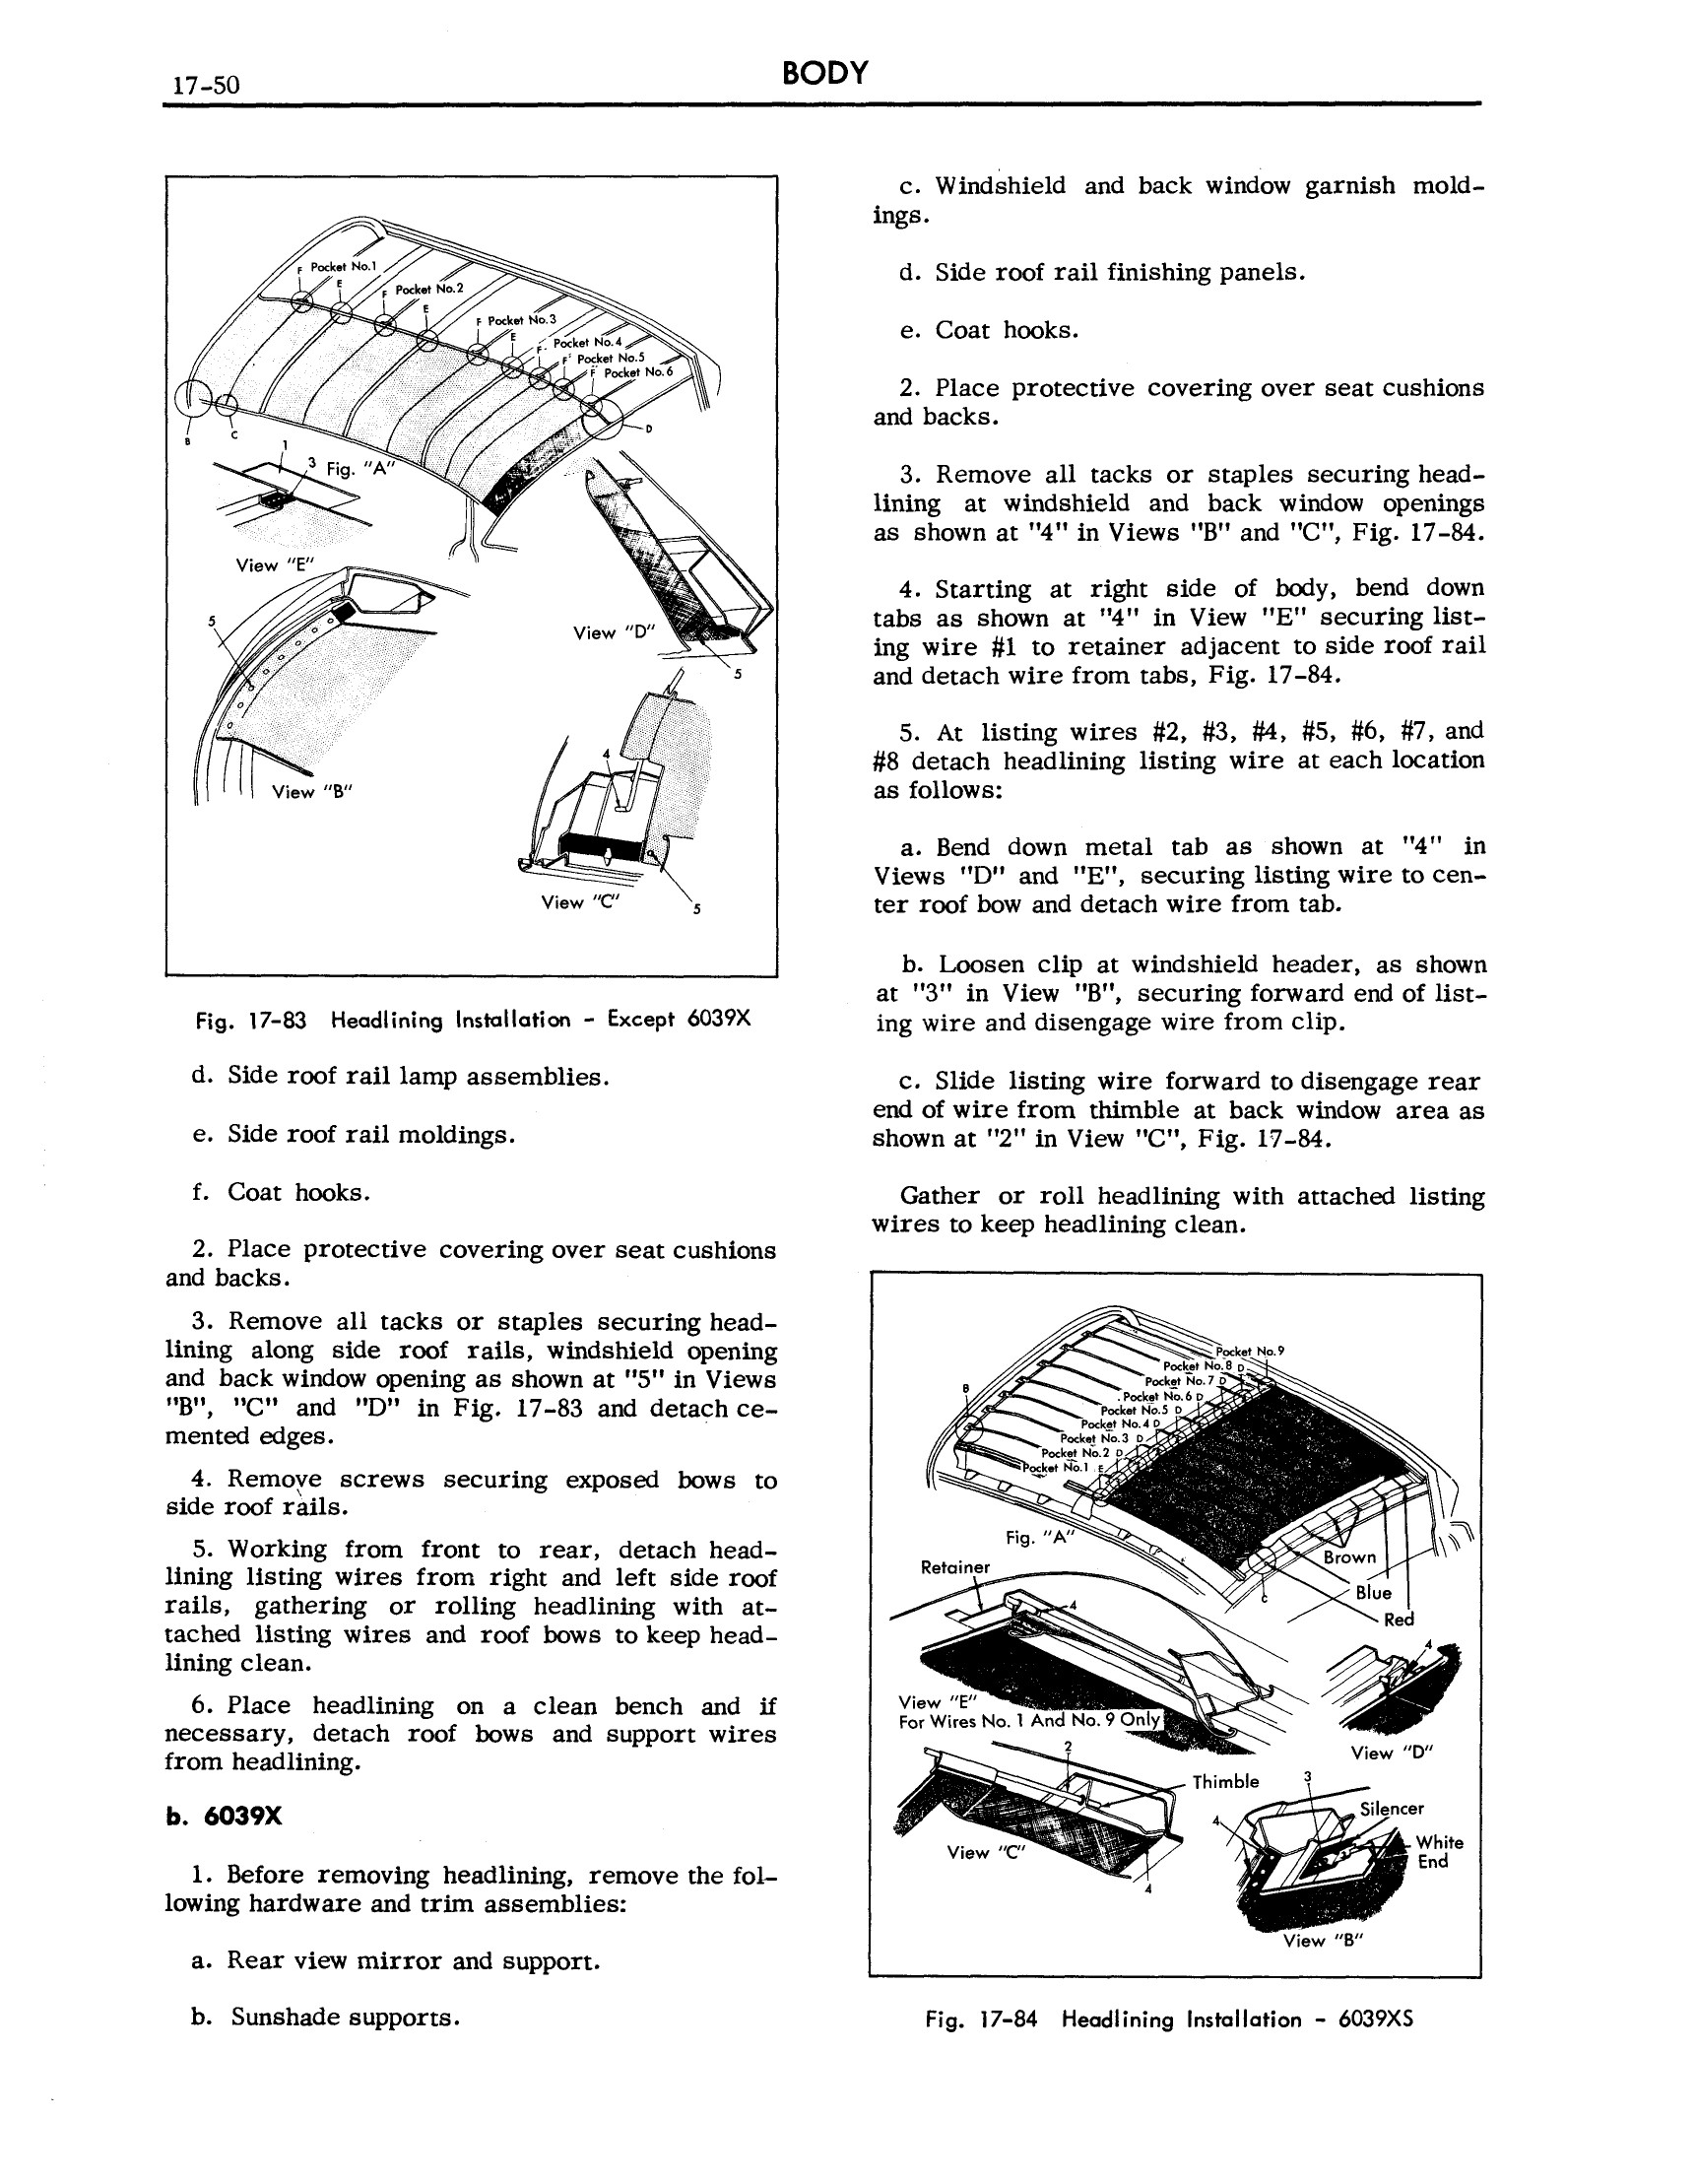 1957 Cadillac Shop Manual- Body Page 50 of 76